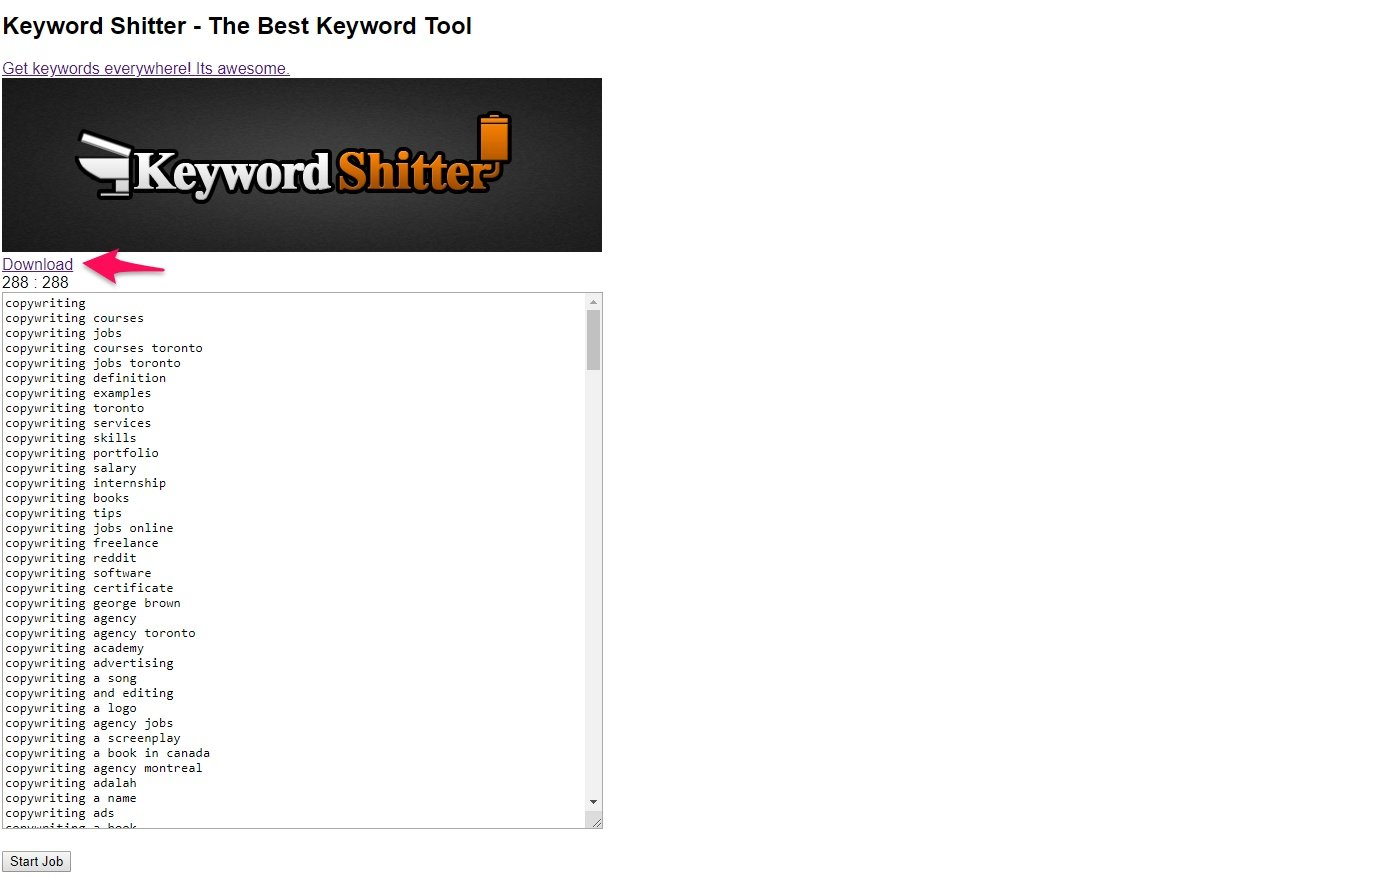 Keyword results